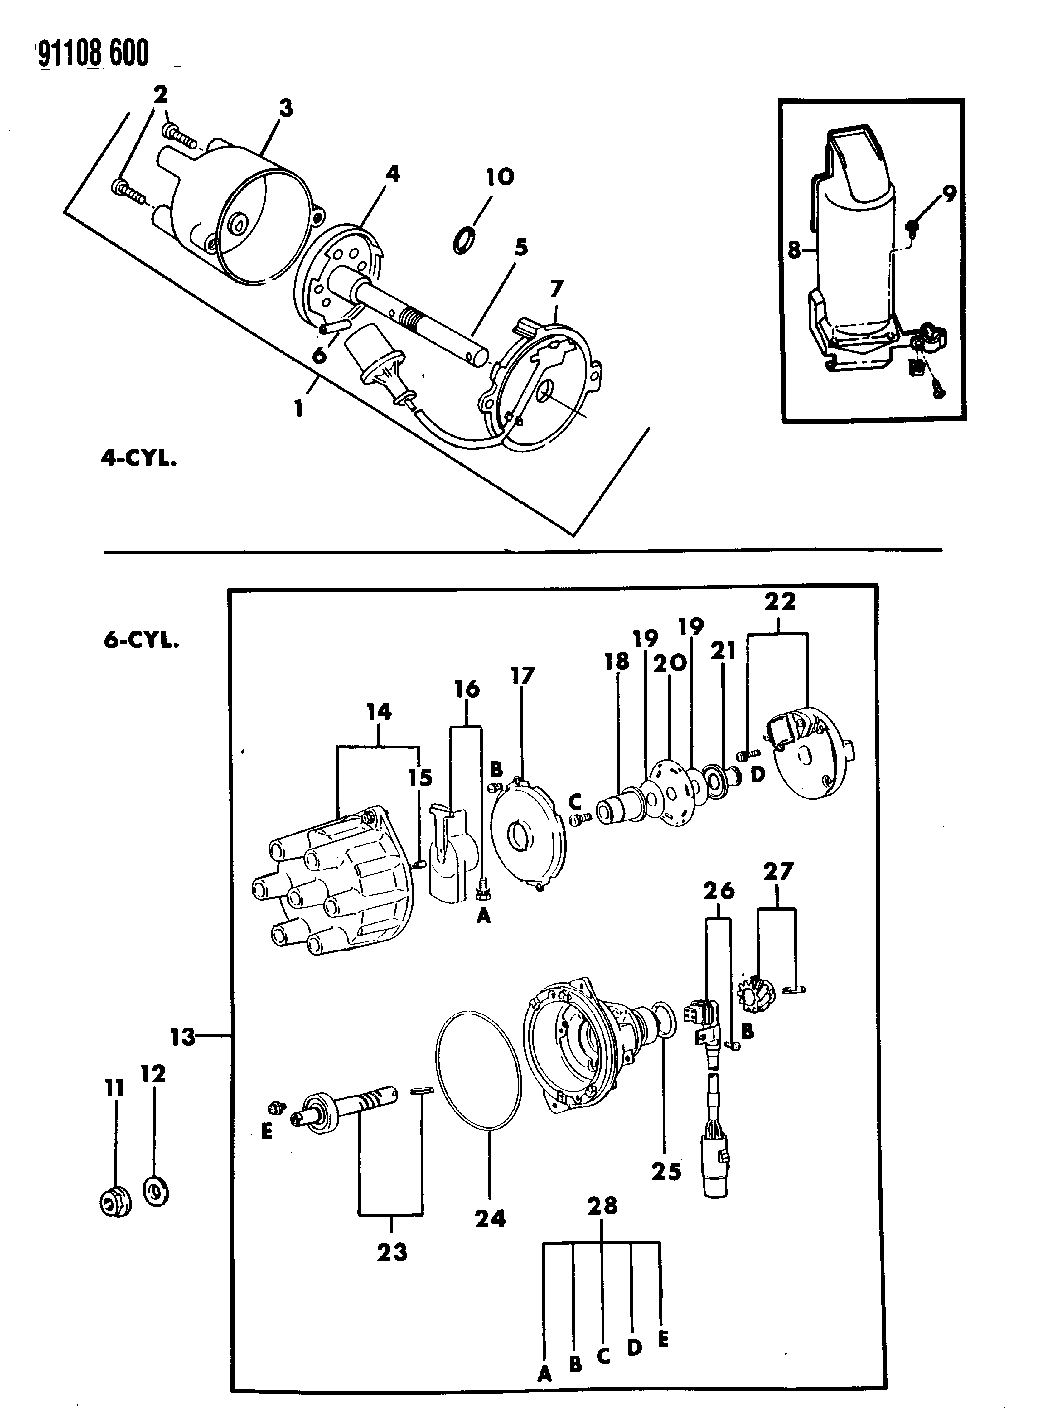 1991 Chrysler Lebaron Gtc Distributor Mopar Parts Giant Wiring Diagram